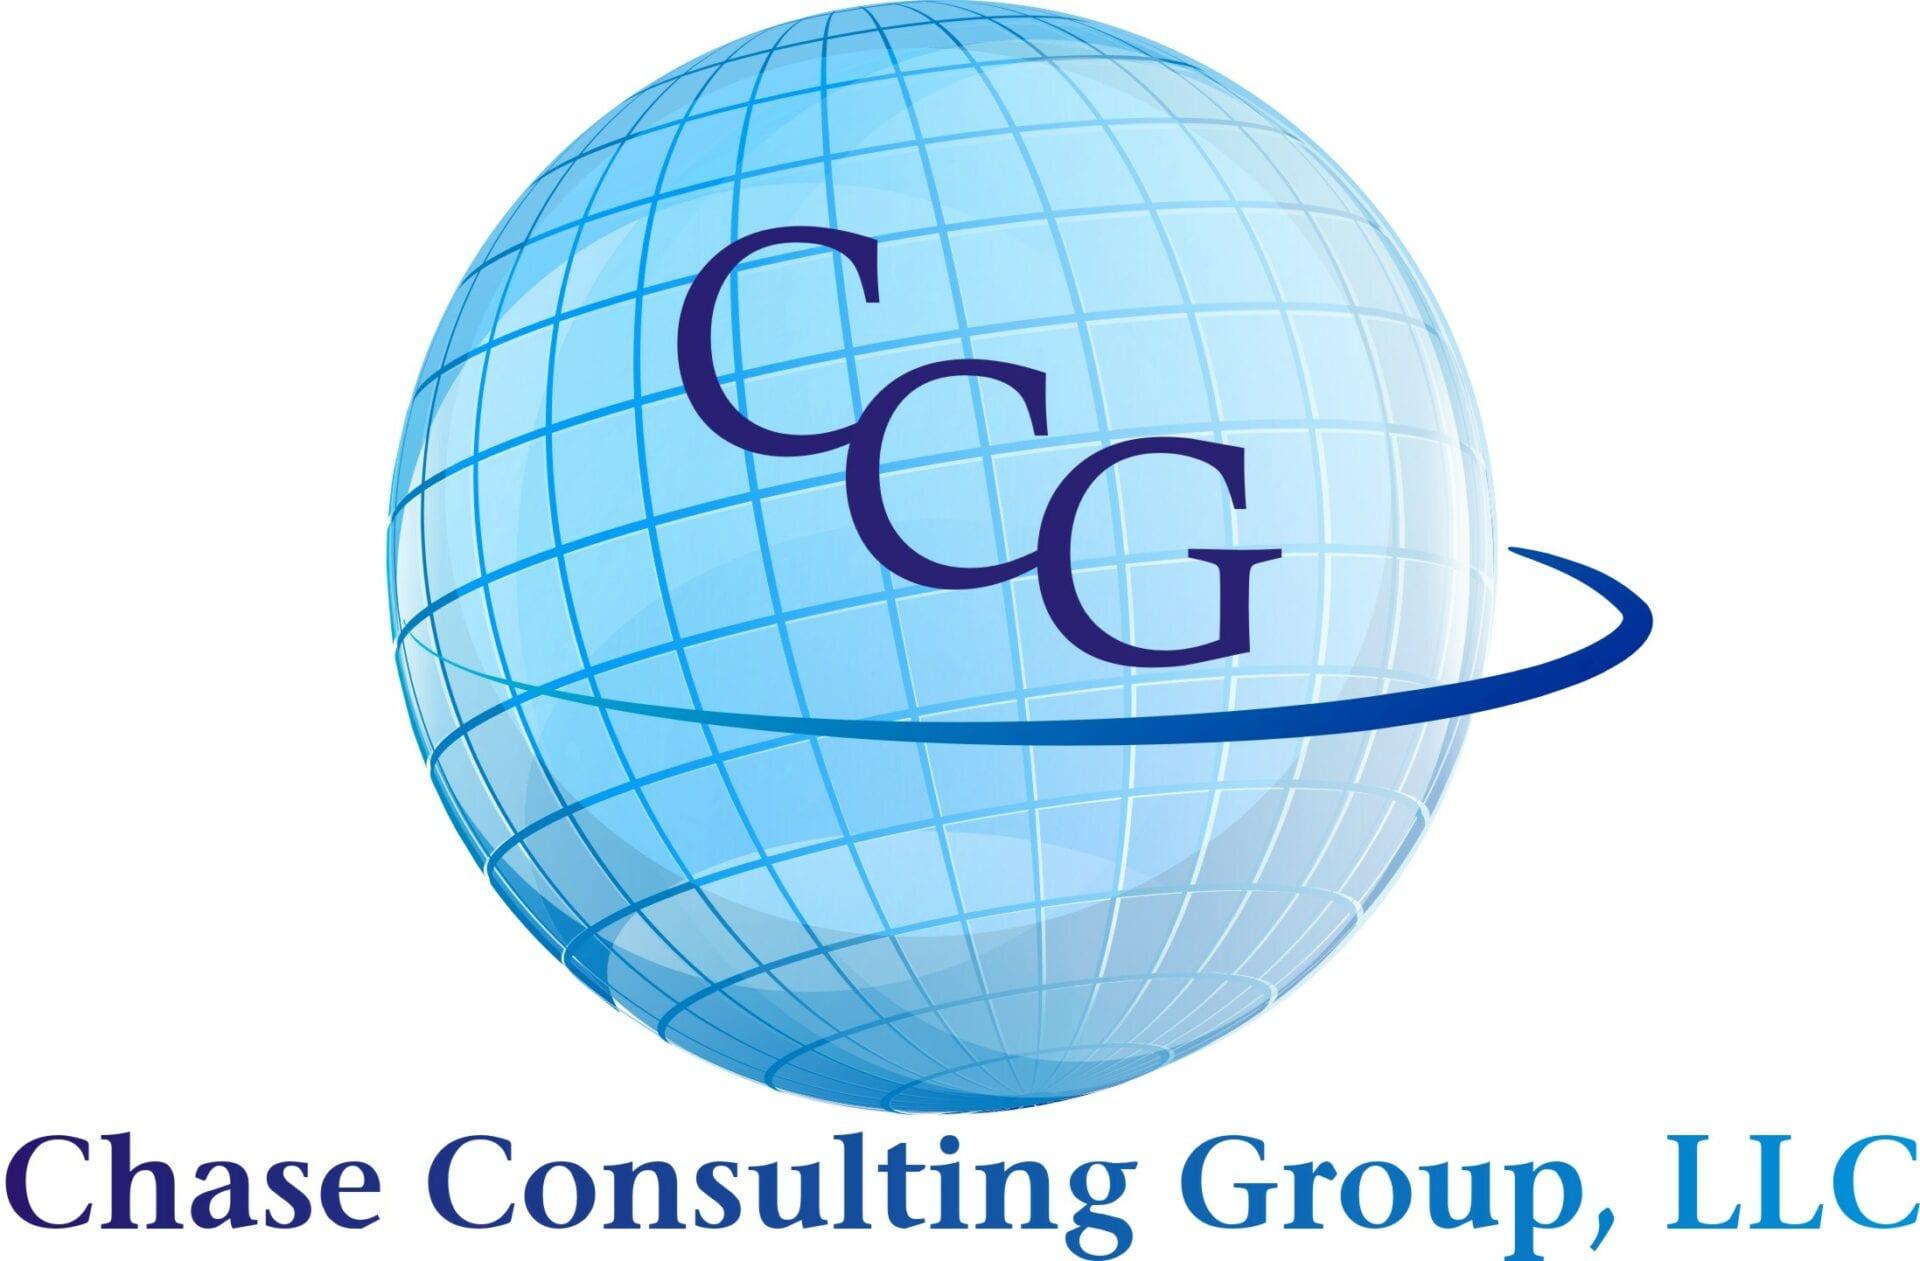 d045b96a-4ce7-404d-b0d5-957d7f3162f2CCG LLC Logo 3 fixed blue